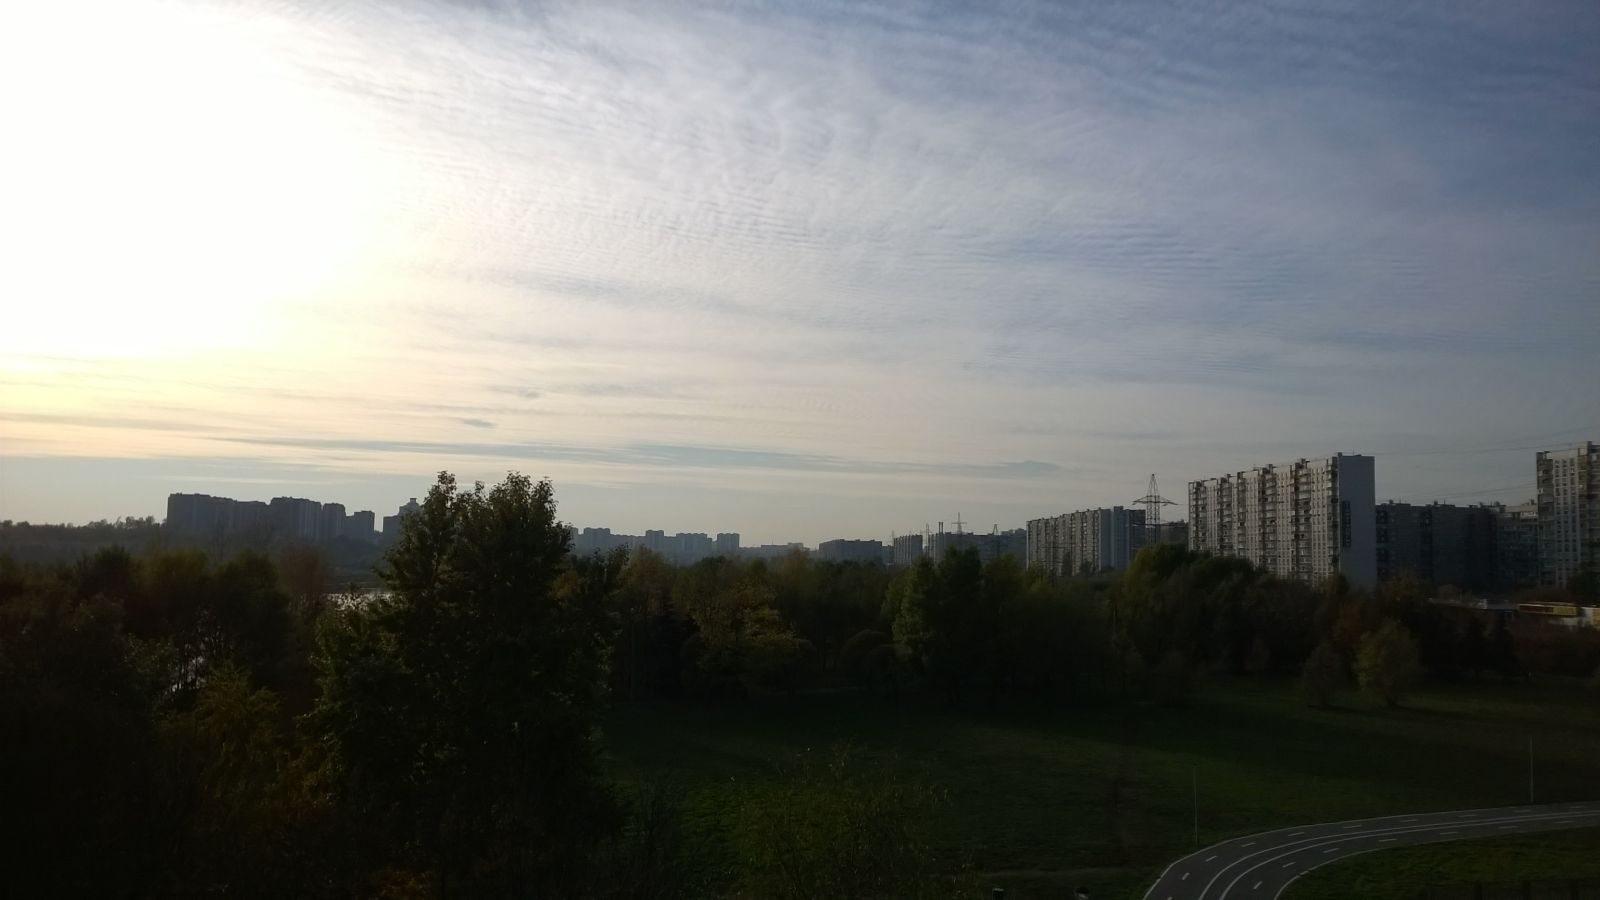 WP_20141008_003